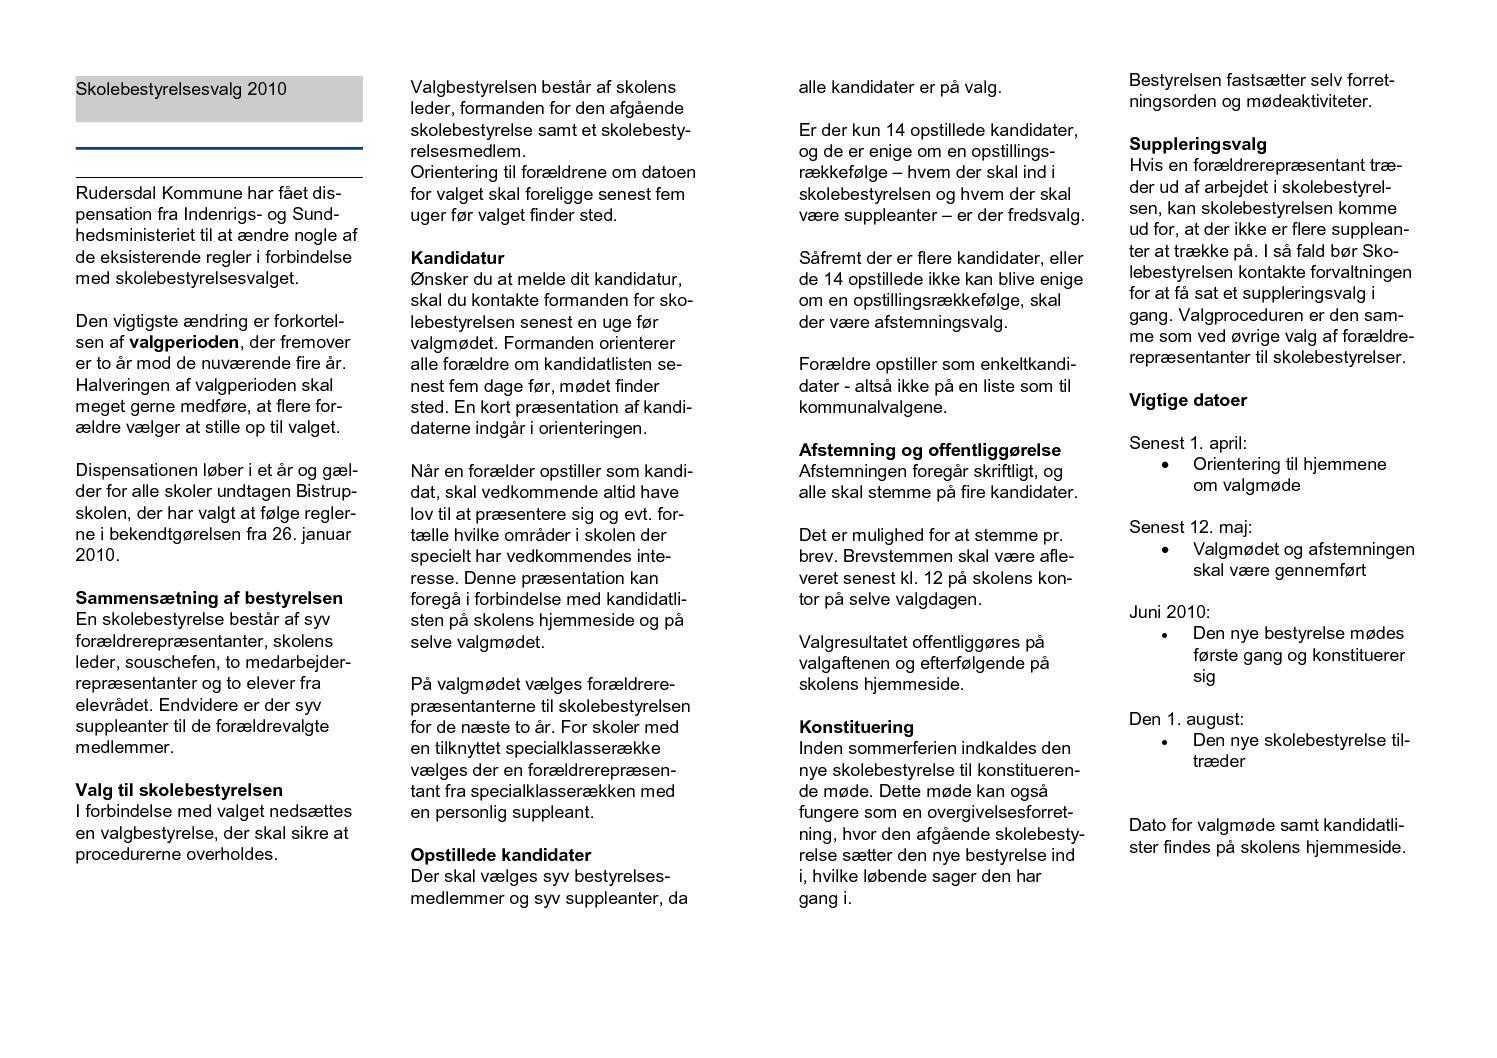 Calaméo - Folder til skolebestyrelsesvalget - 2010 _2_